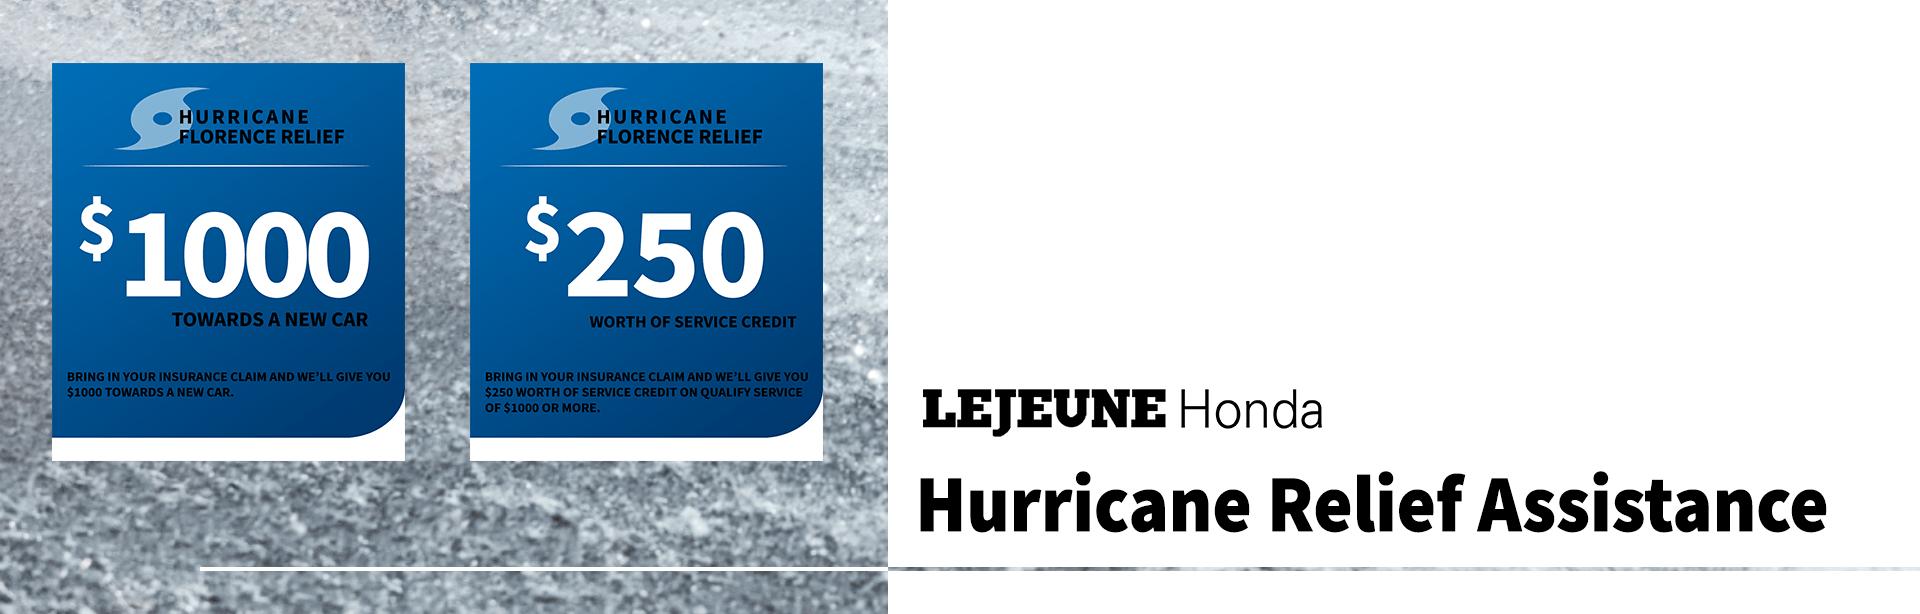 Hurricane Florence Relief Program